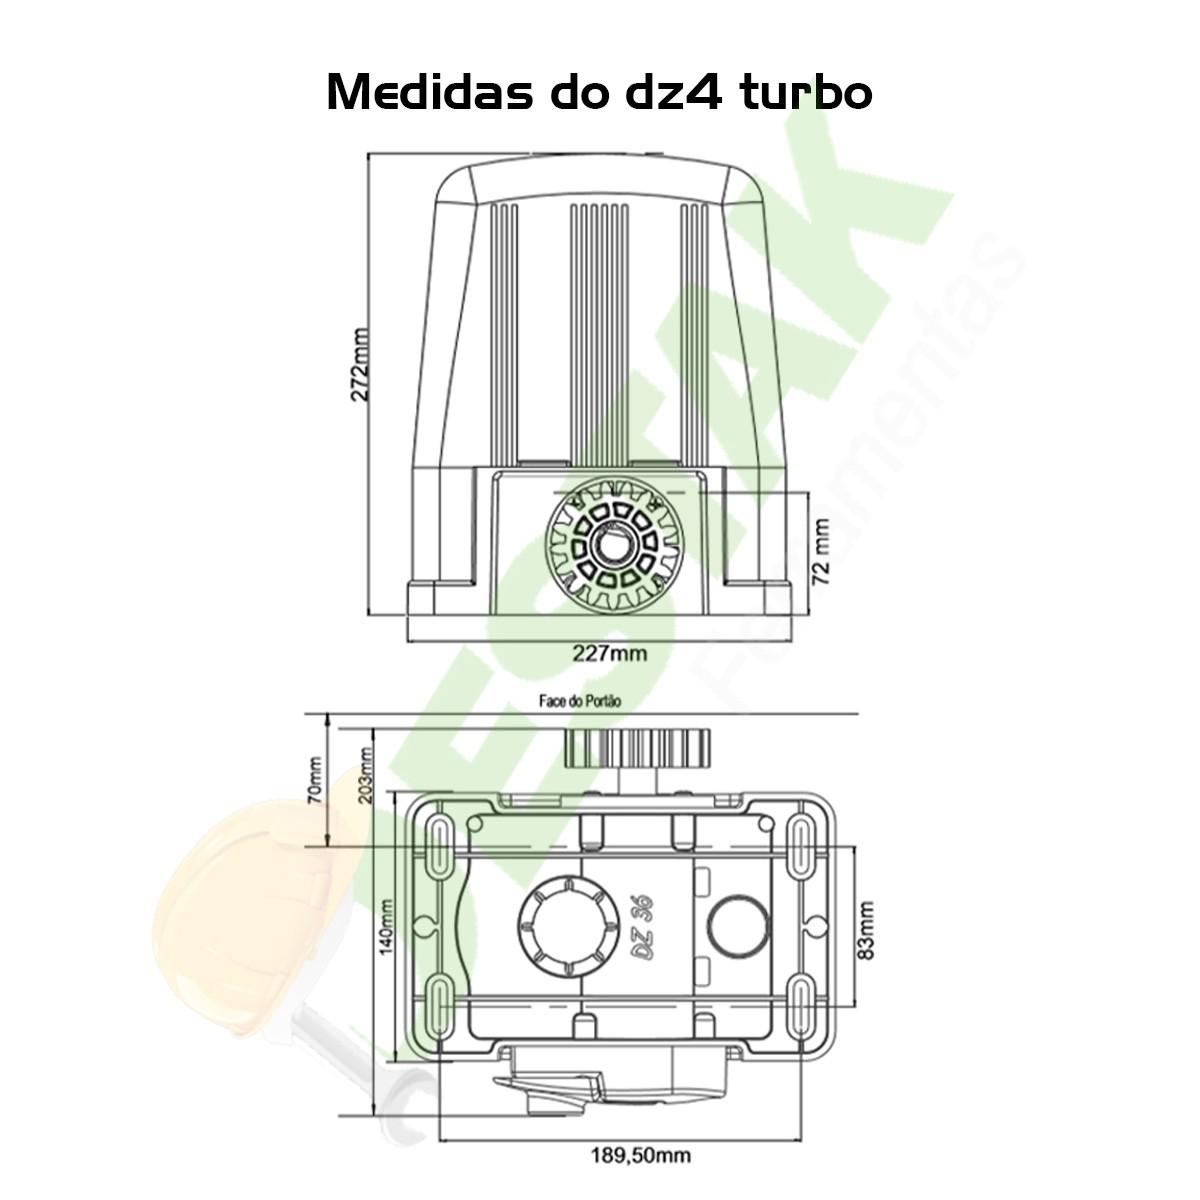 Kit Motor Dz Rossi Dz4 1/3 Sk Turbo 3m Cremalhe 4 Controles 127v